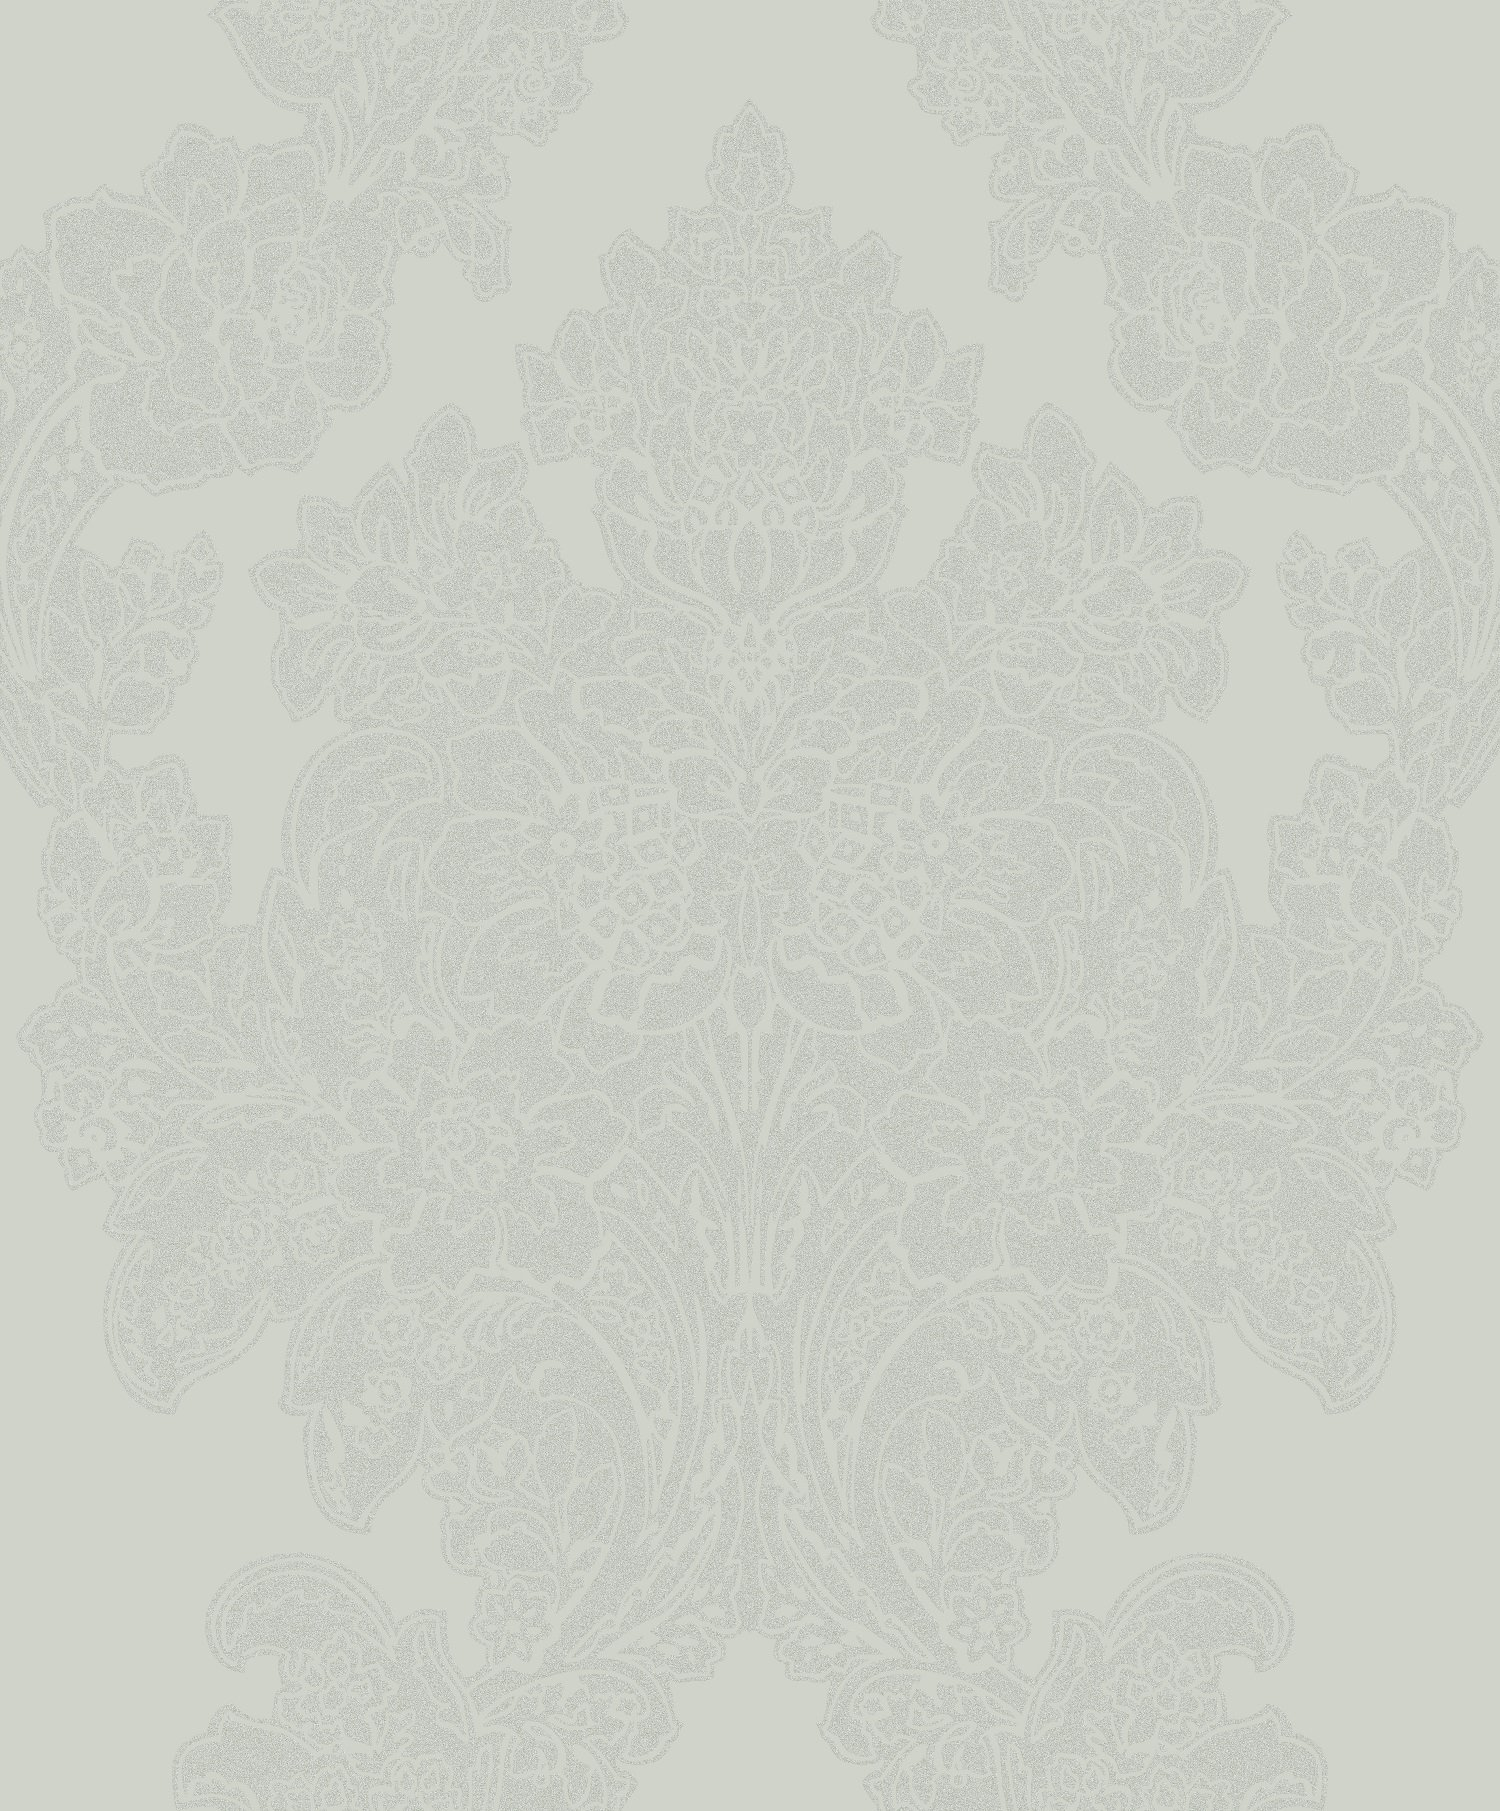 Немецкие обои Hohenberger,  коллекция Love, артикул81002